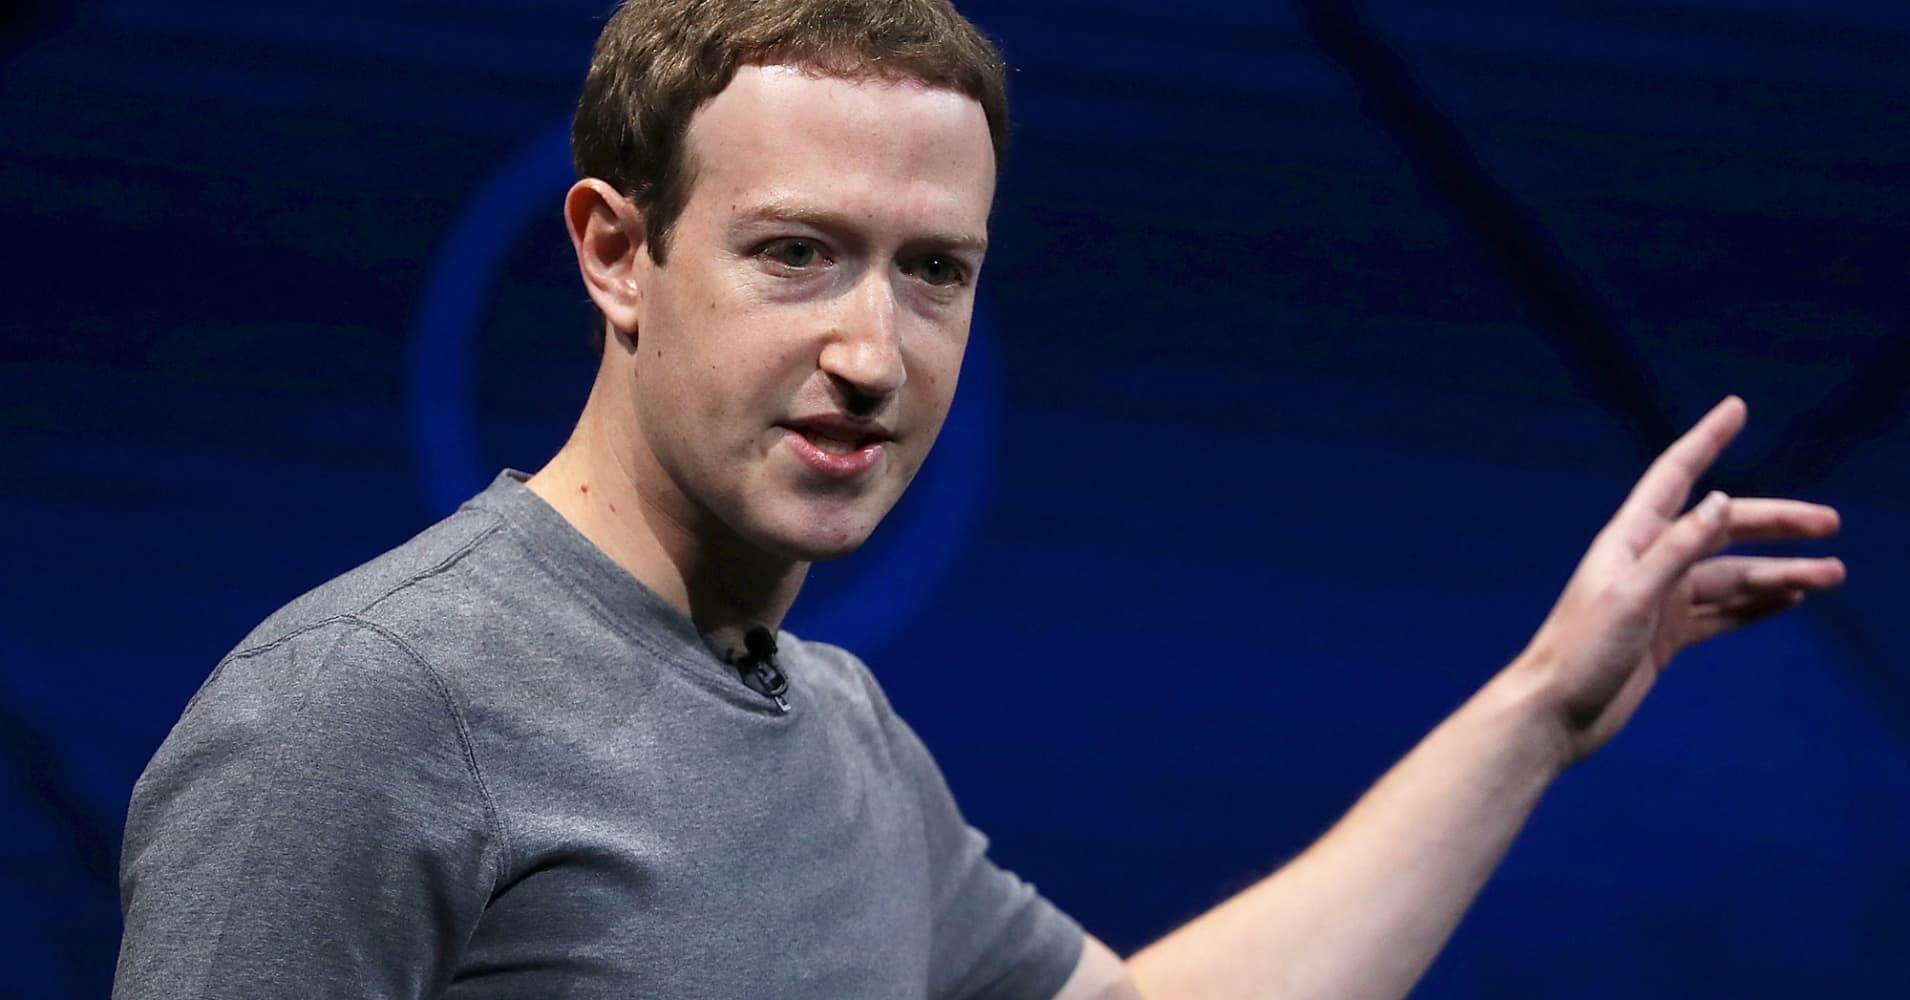 Facebook shareholders to confront Zuckerberg over fake news